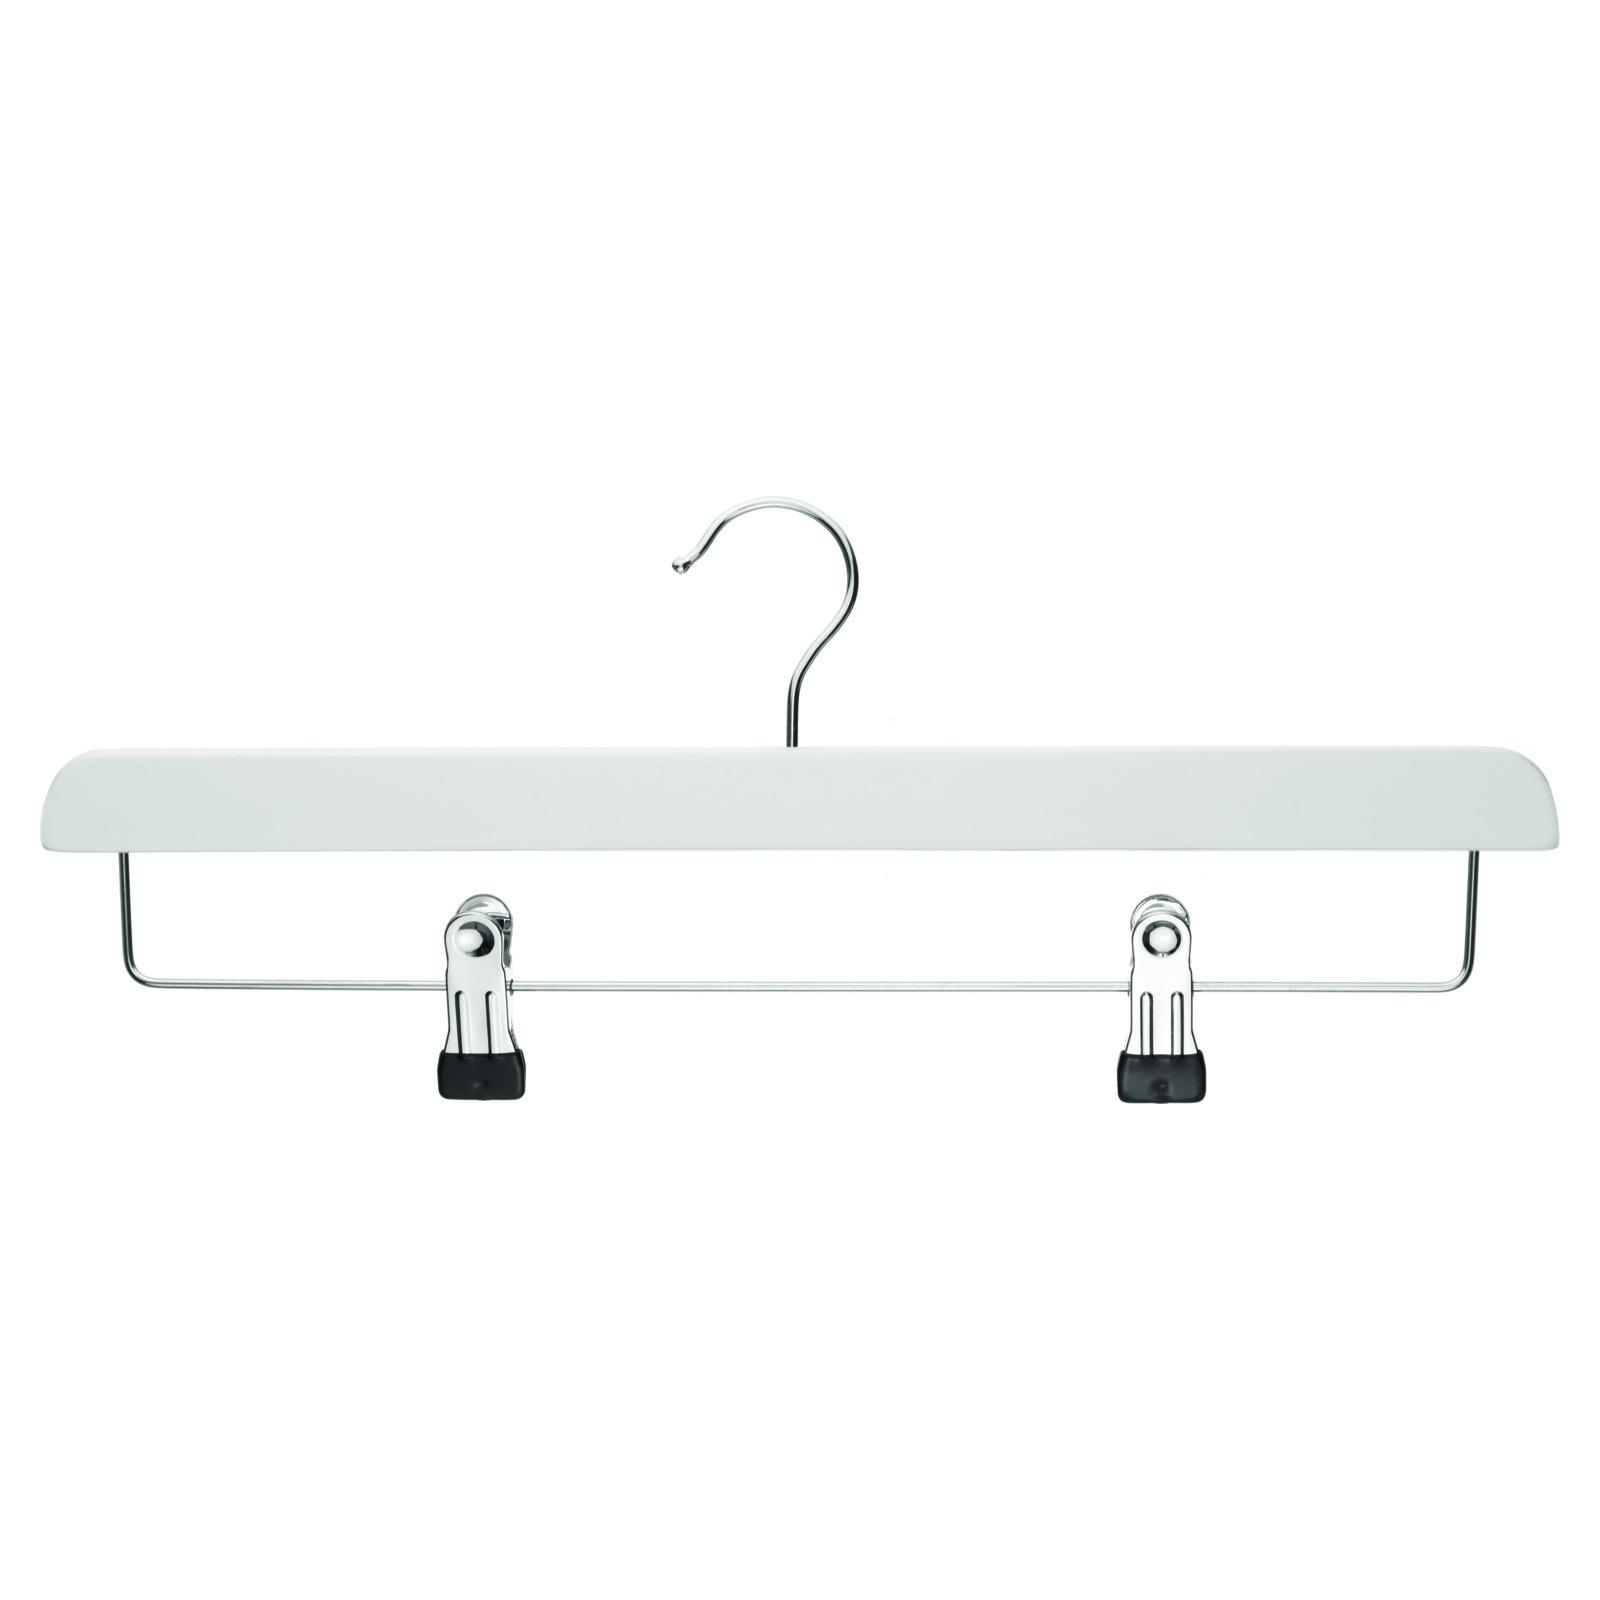 Klammerbügel 40 cm Metall Kleiderbügel Ladenausstattung Garderobe Hosen Bügel